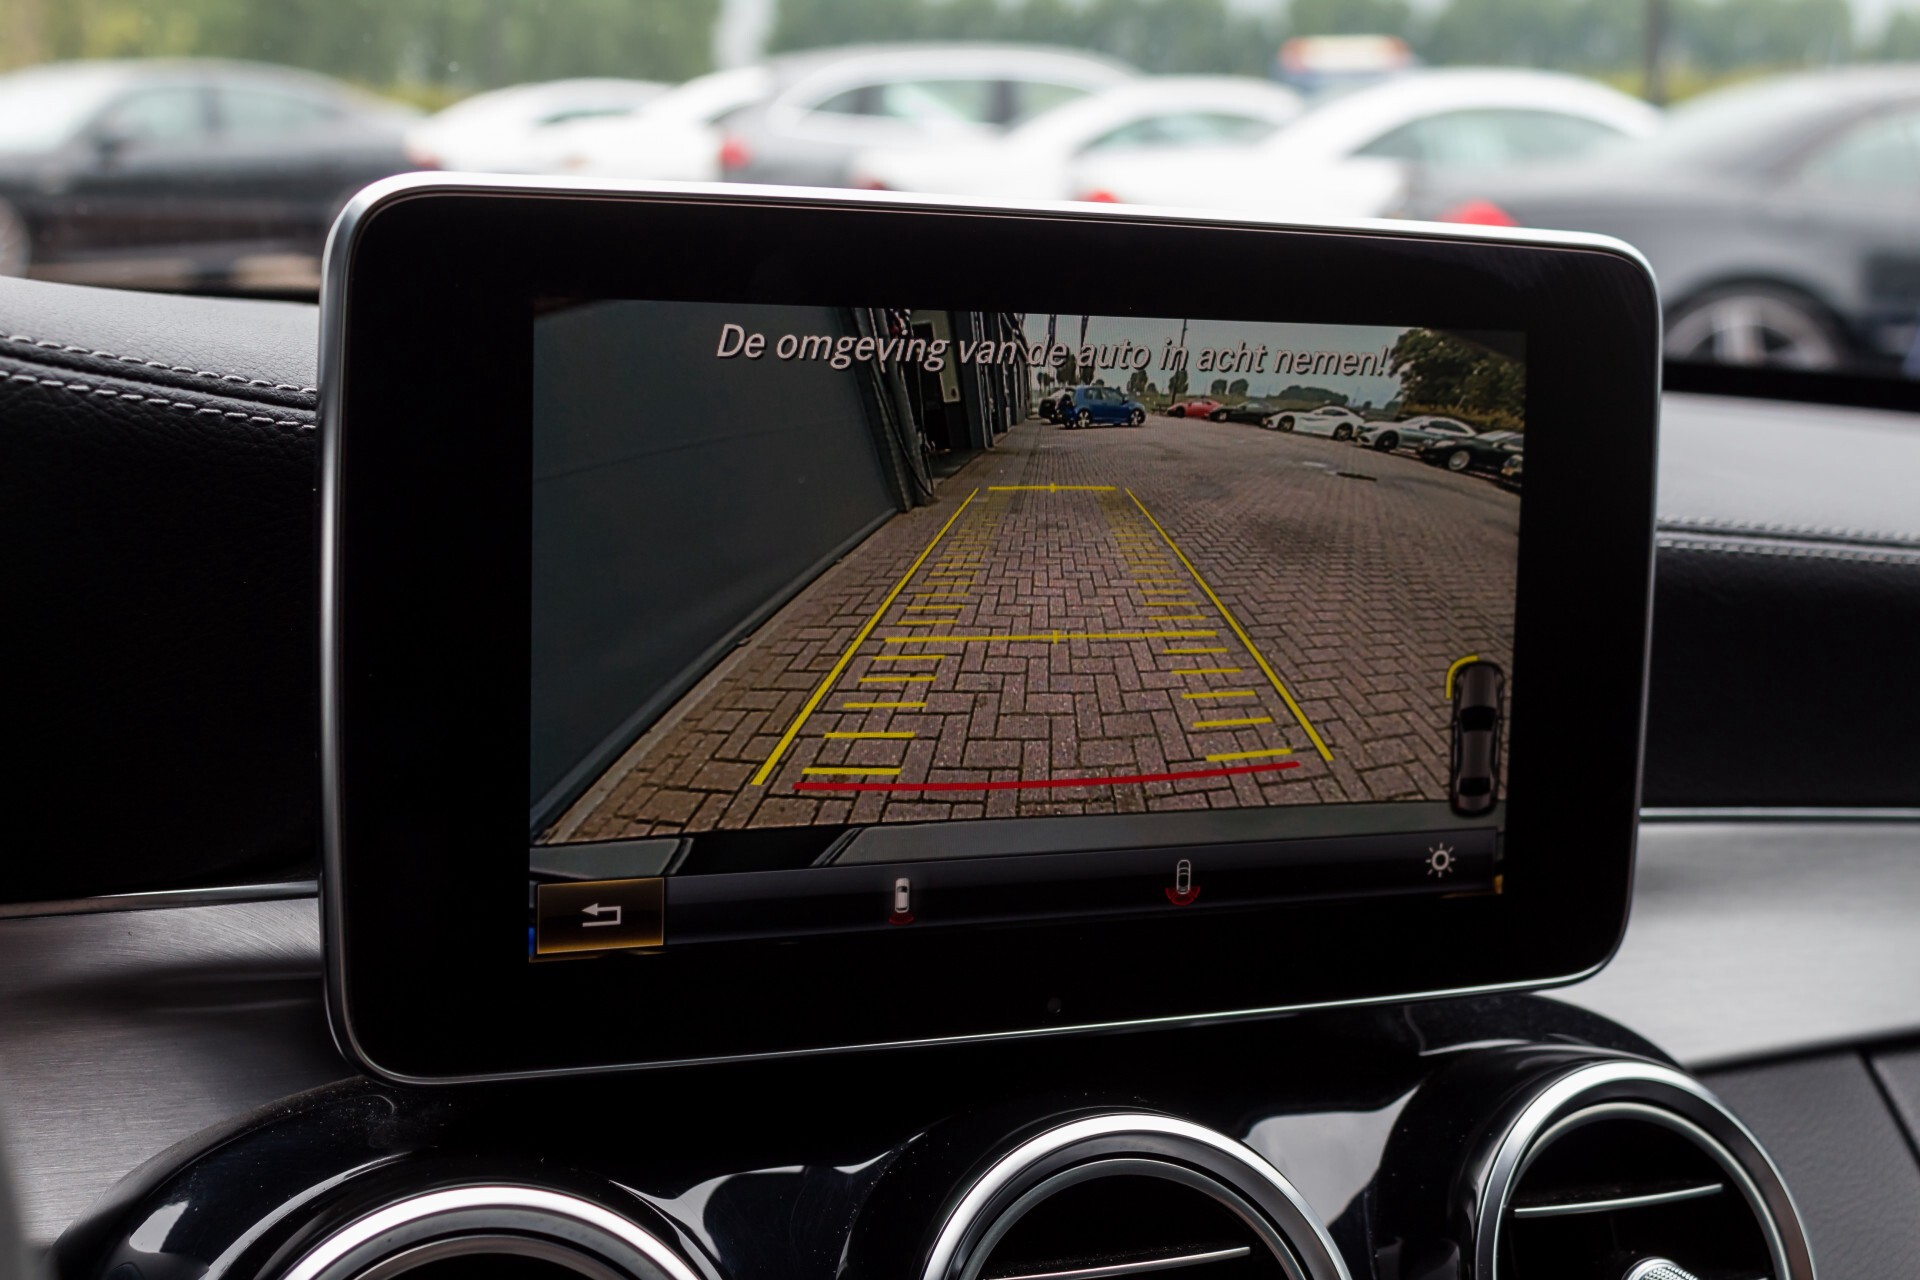 Mercedes-Benz C-Klasse 63 AMG S Panorama/Distronic/Keyless/Comand/Camera/ILS Aut7 Foto 20